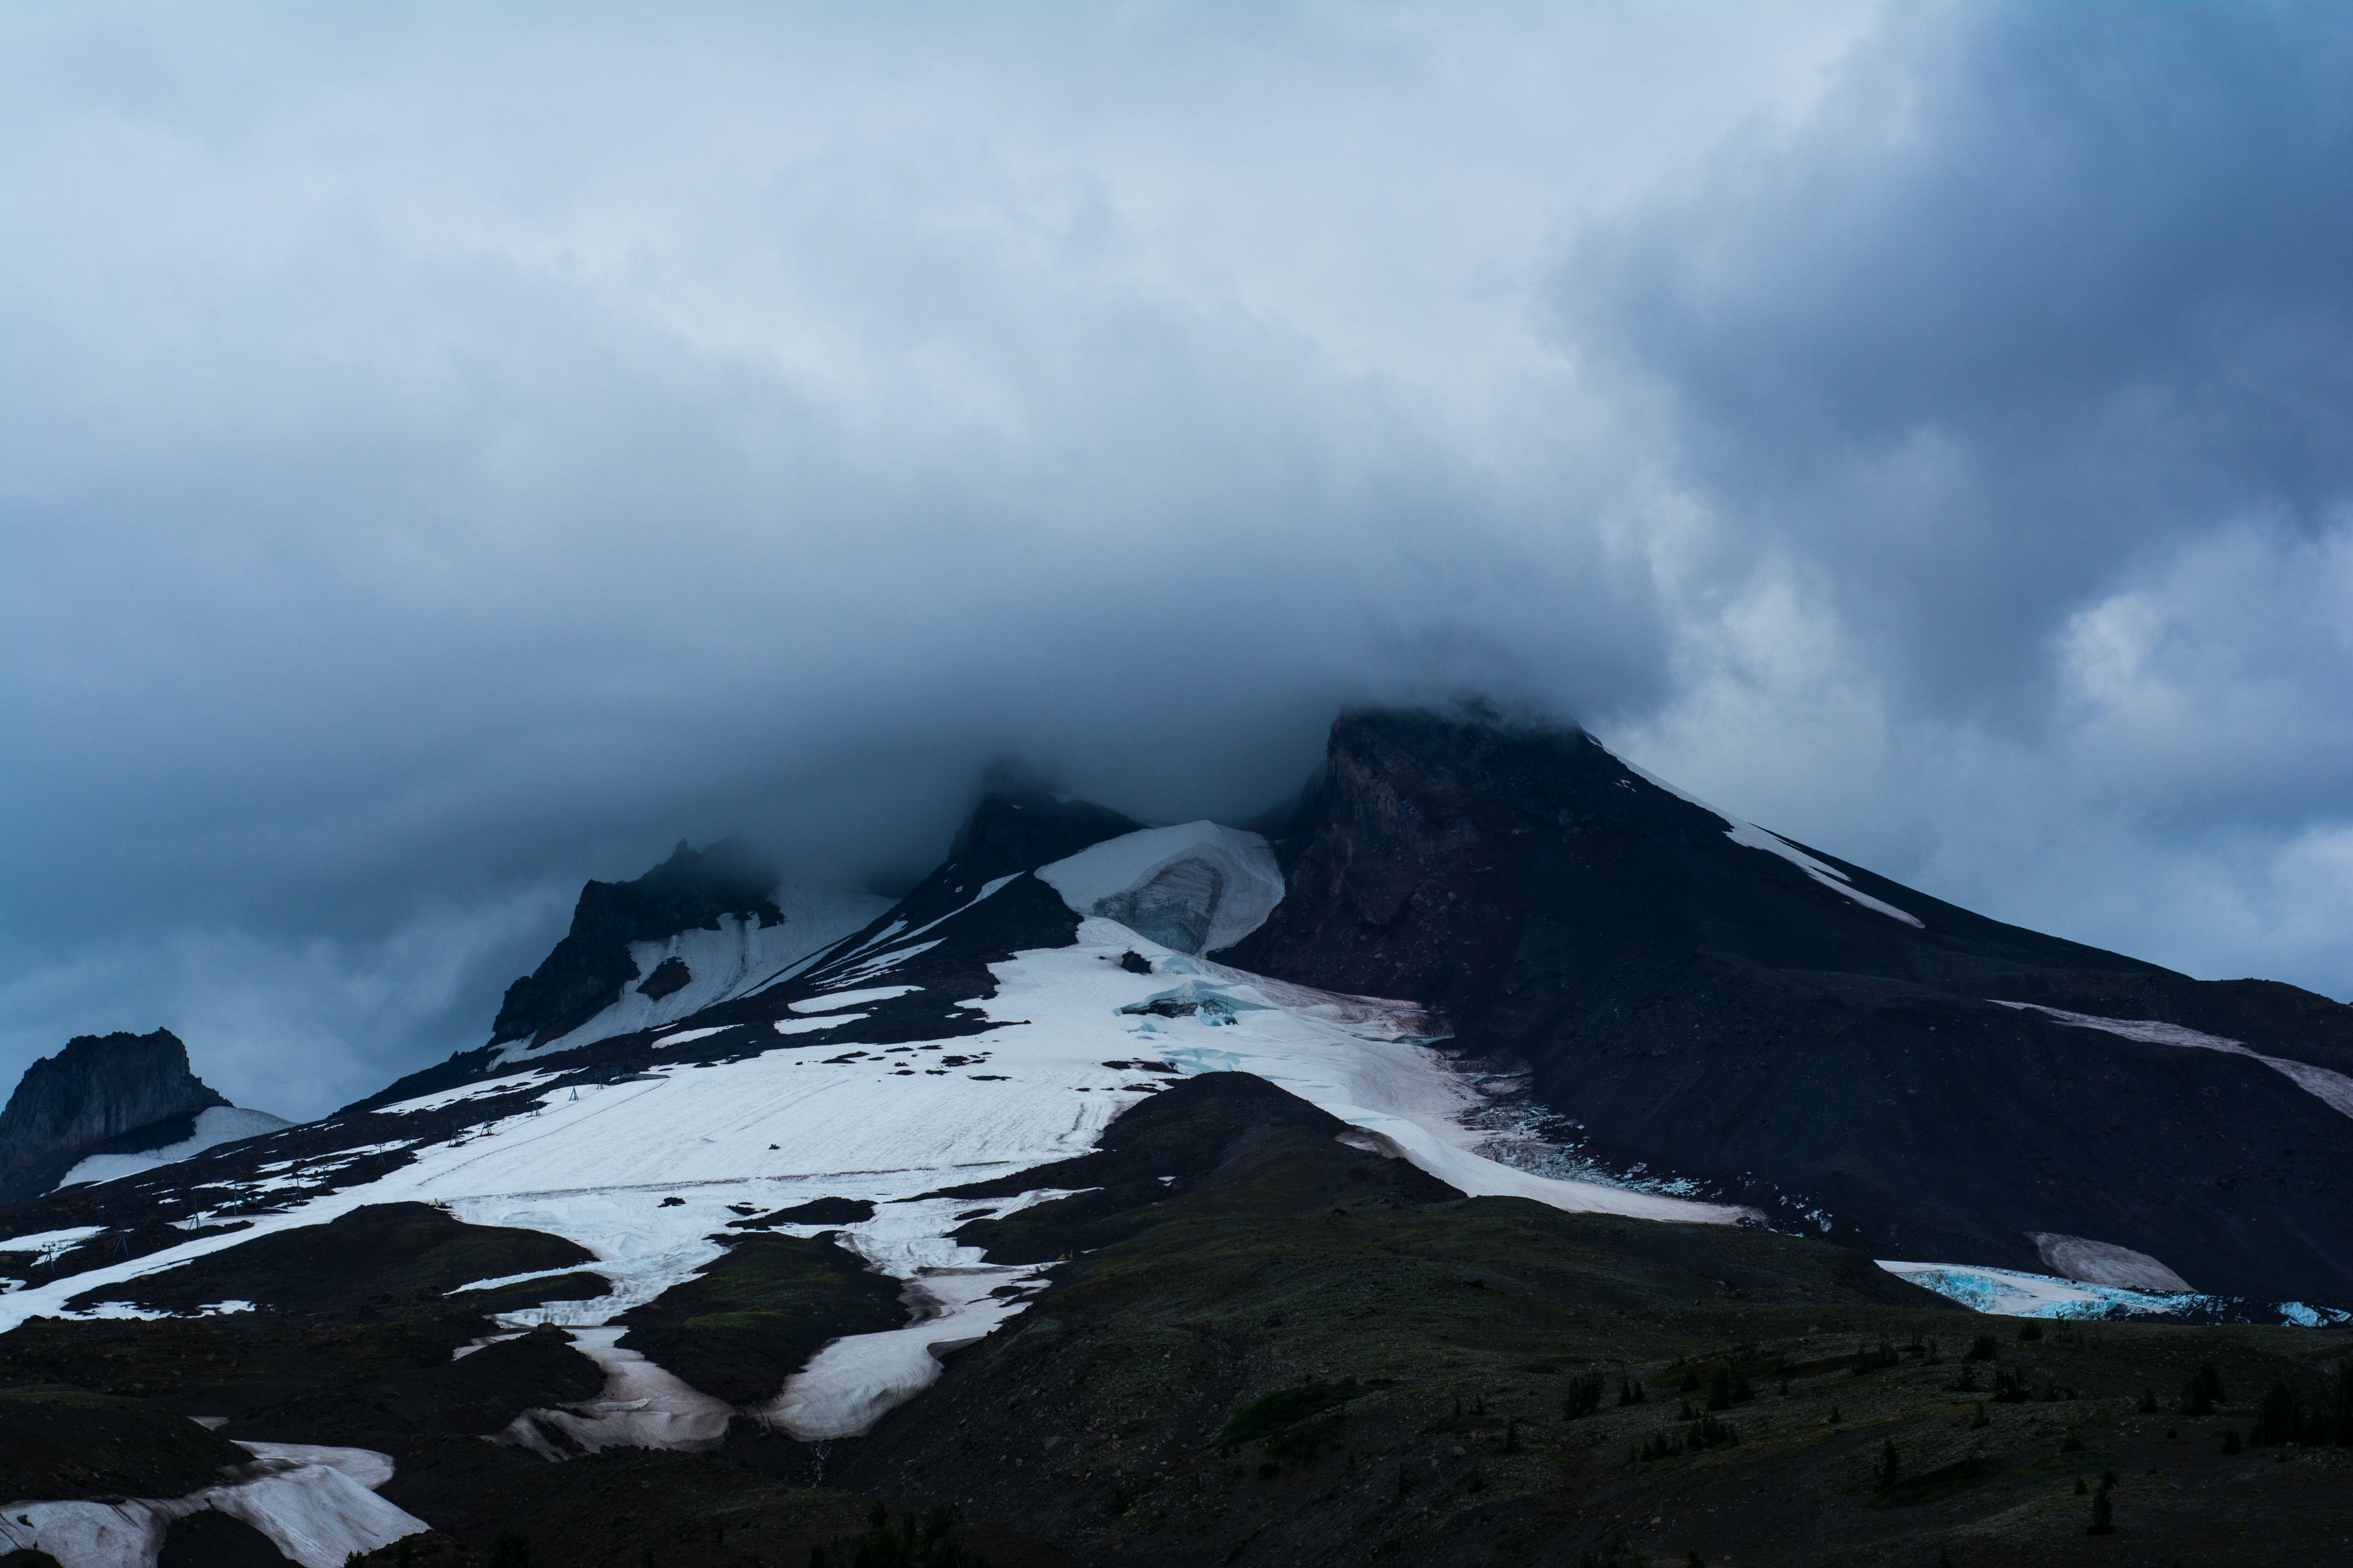 Free stock photo of cloudy mountain, mountain, mt. hood, snow capped mountain